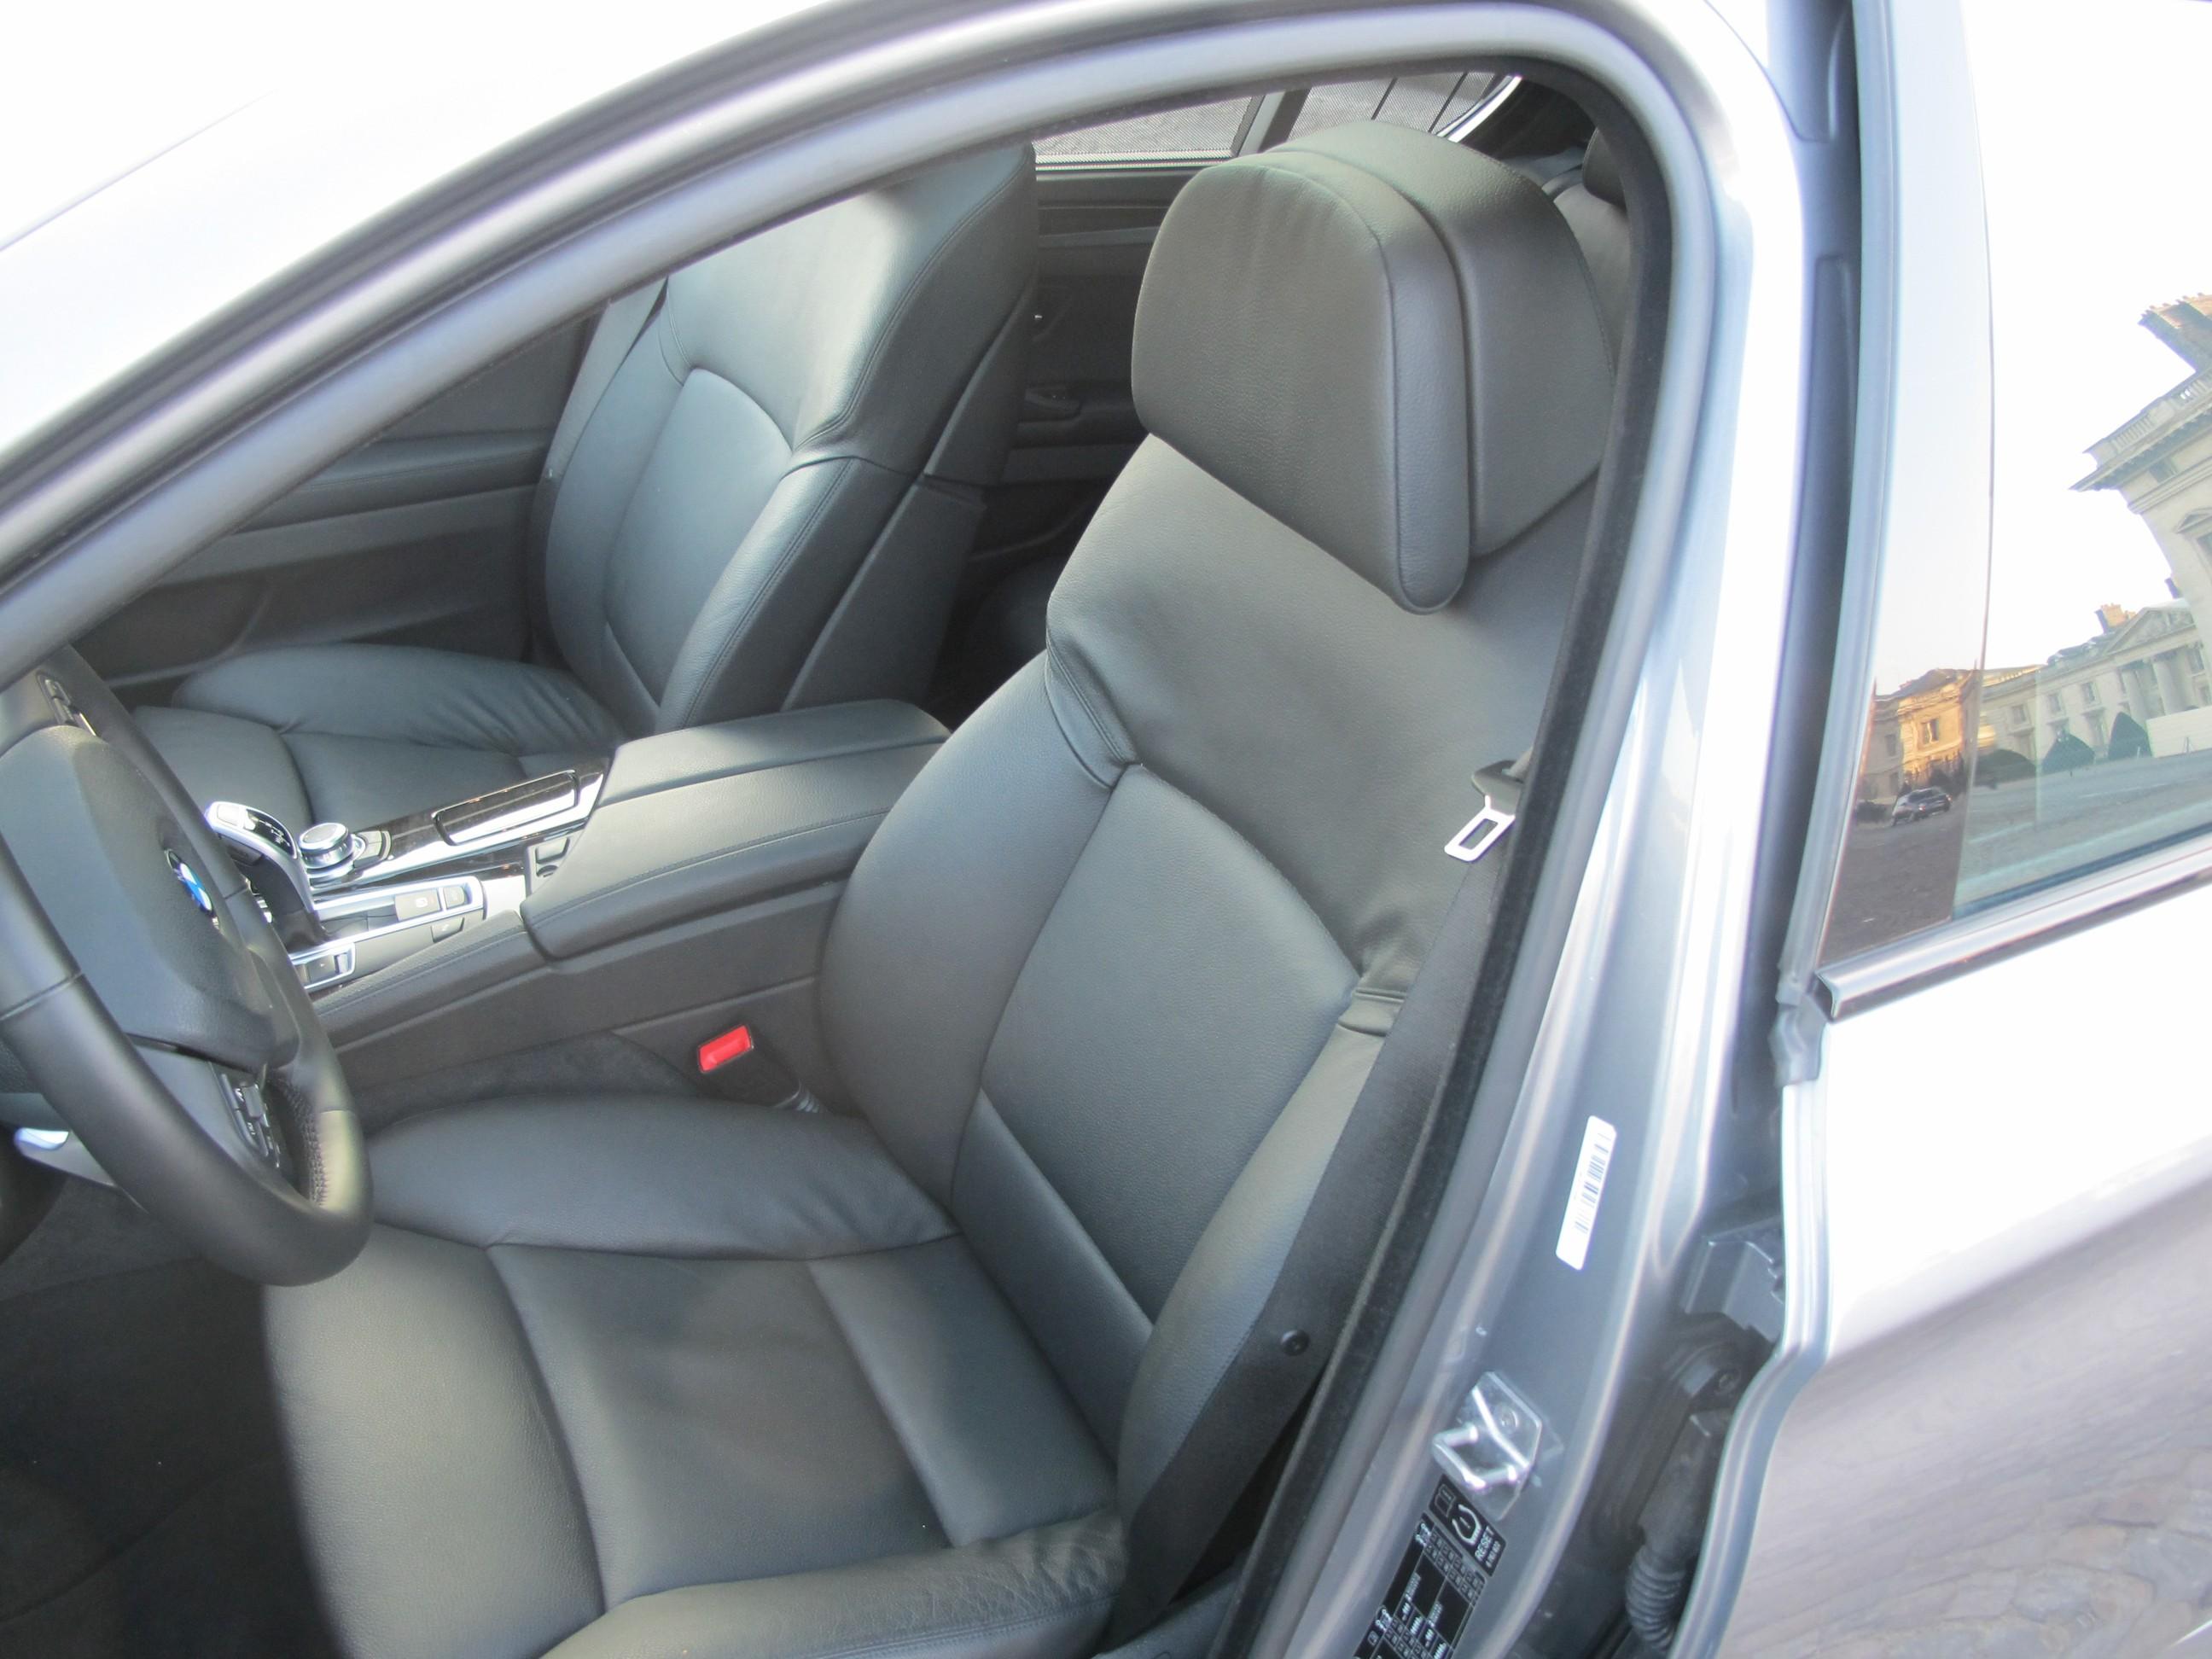 fiche technique bmw s rie 5 e39 525tds auto titre. Black Bedroom Furniture Sets. Home Design Ideas